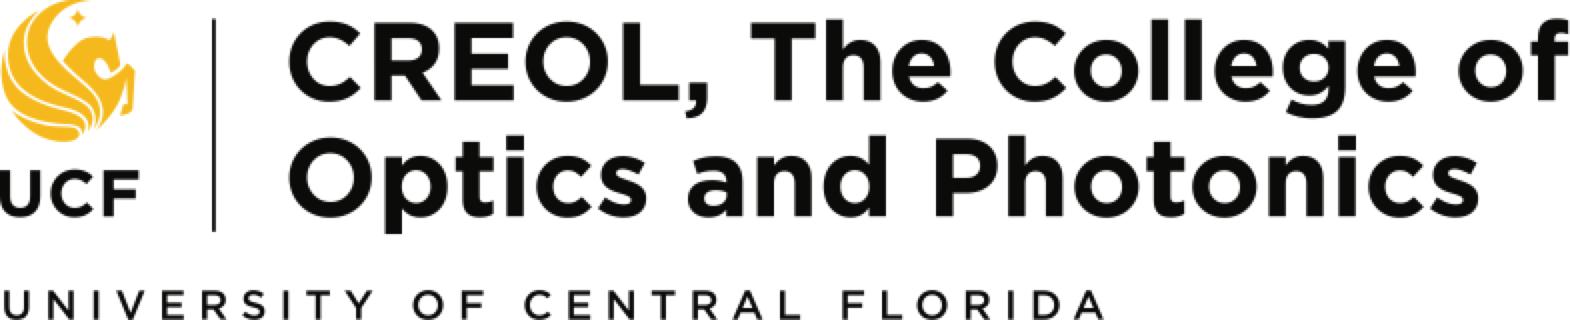 UILexternal_KGrgb_CREOL, The College of Optics and Photonics-300dpi.png